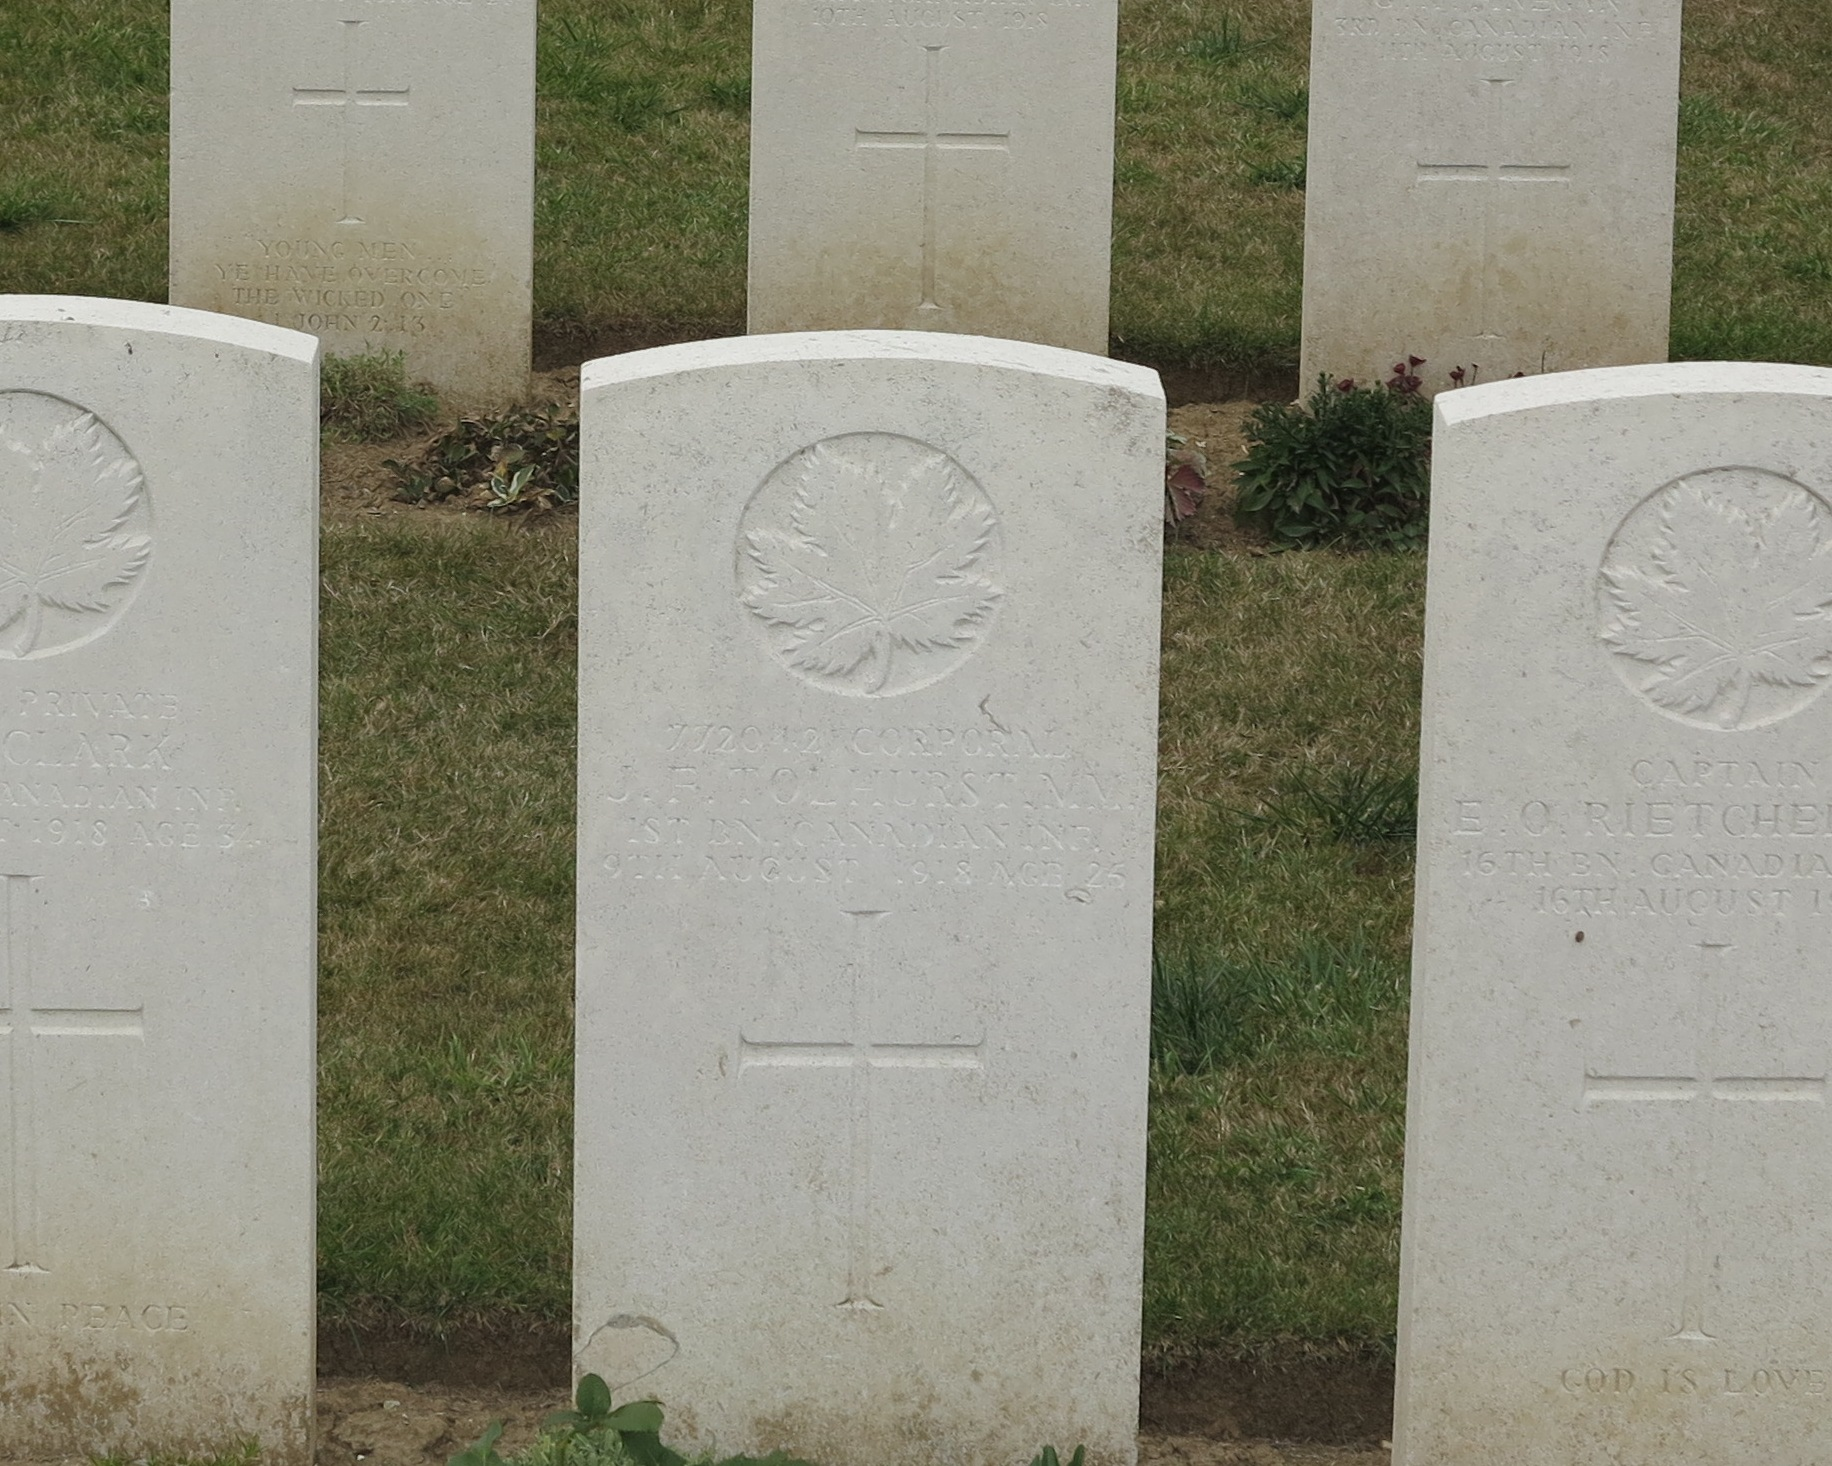 Grave Marker– 772042 Corporal J F Tolhurst 1st BN CANADIAN INF. 9th August 1918  Age 25